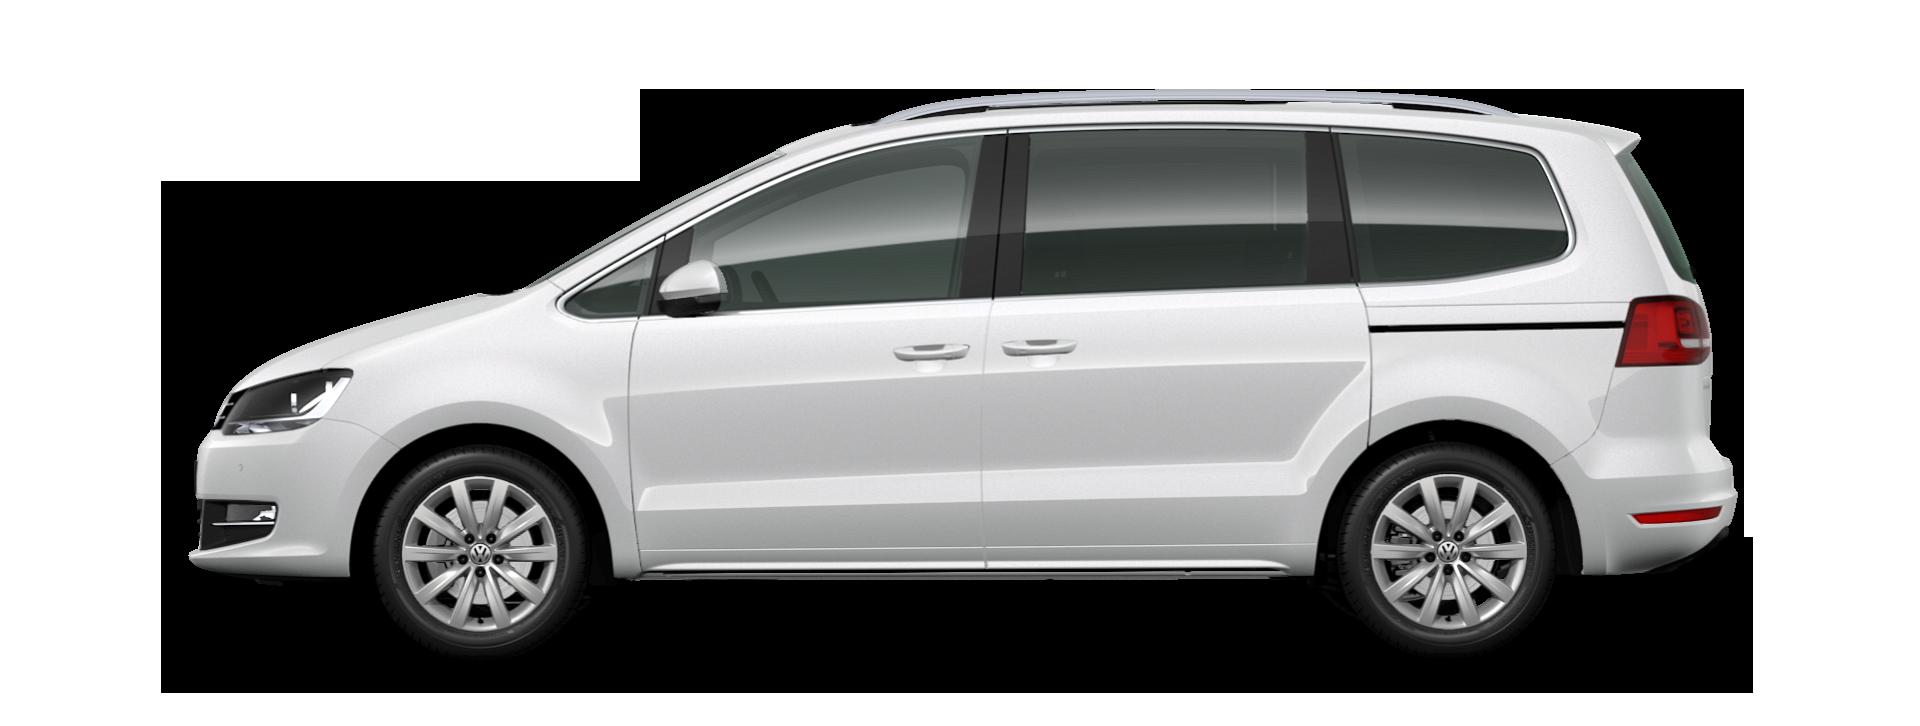 Minivan clipart mpv. Used cars sharan